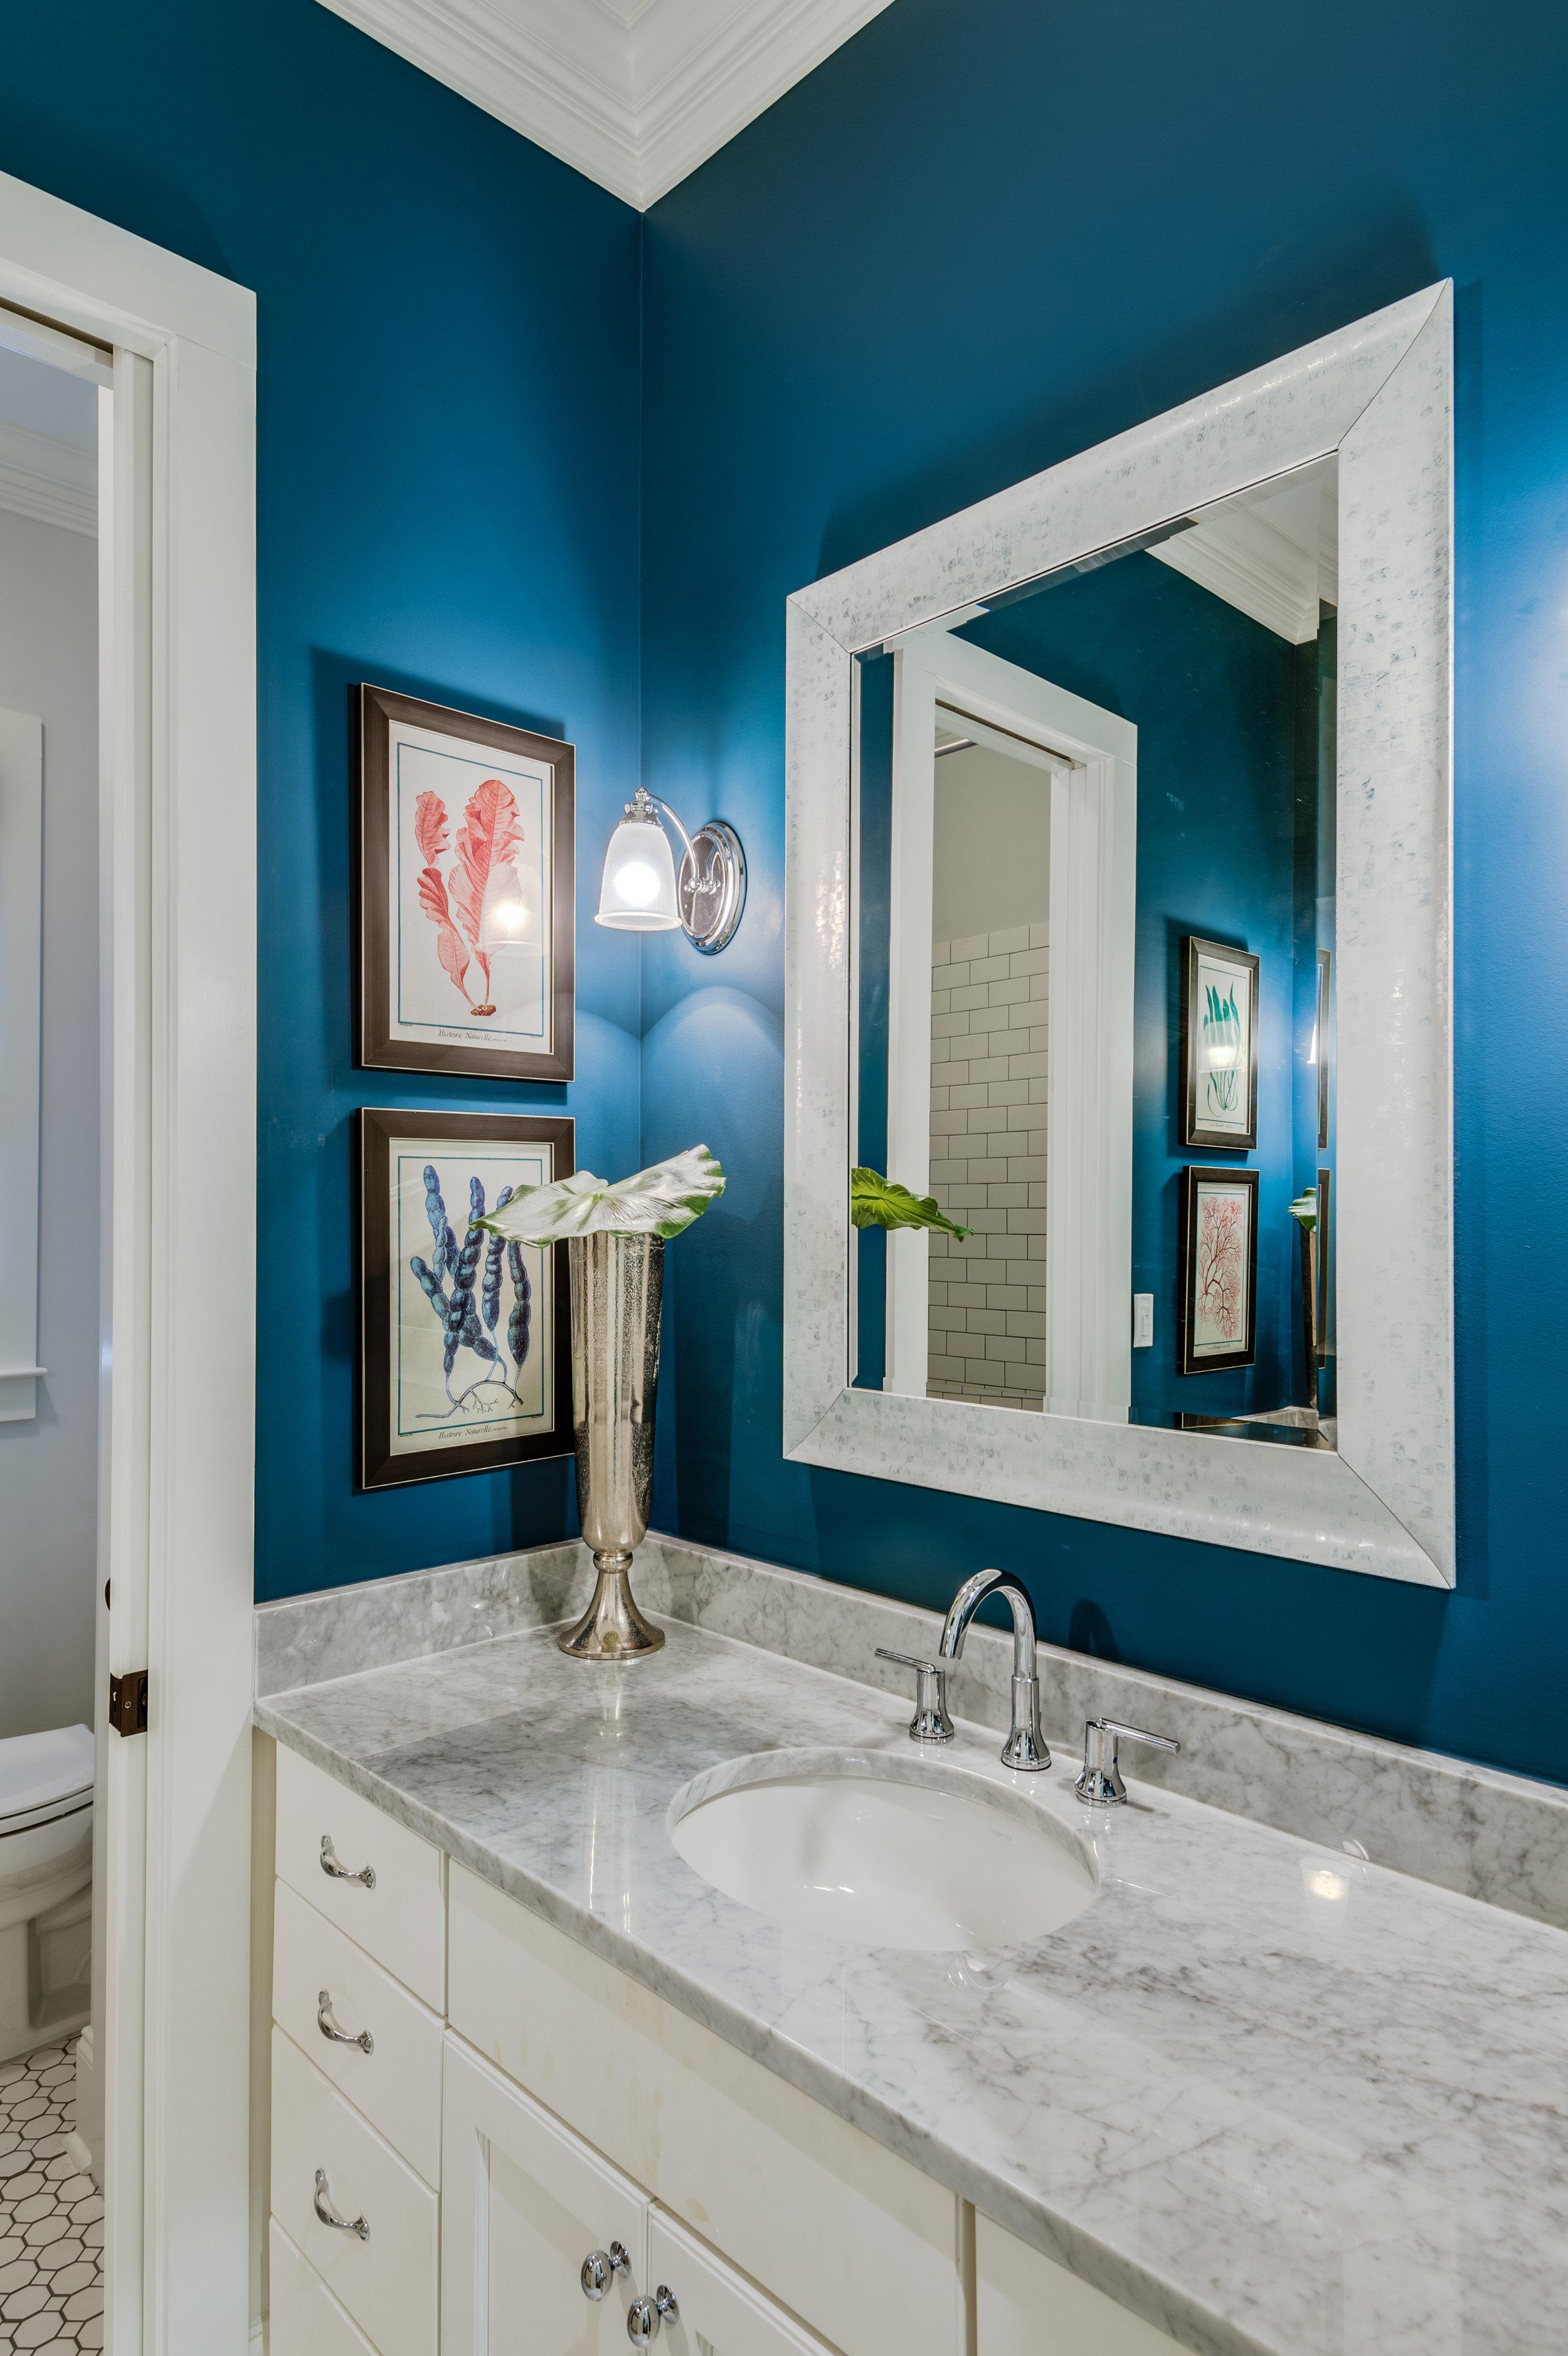 blue and white bathroom metairie luxury interior design khb interiors